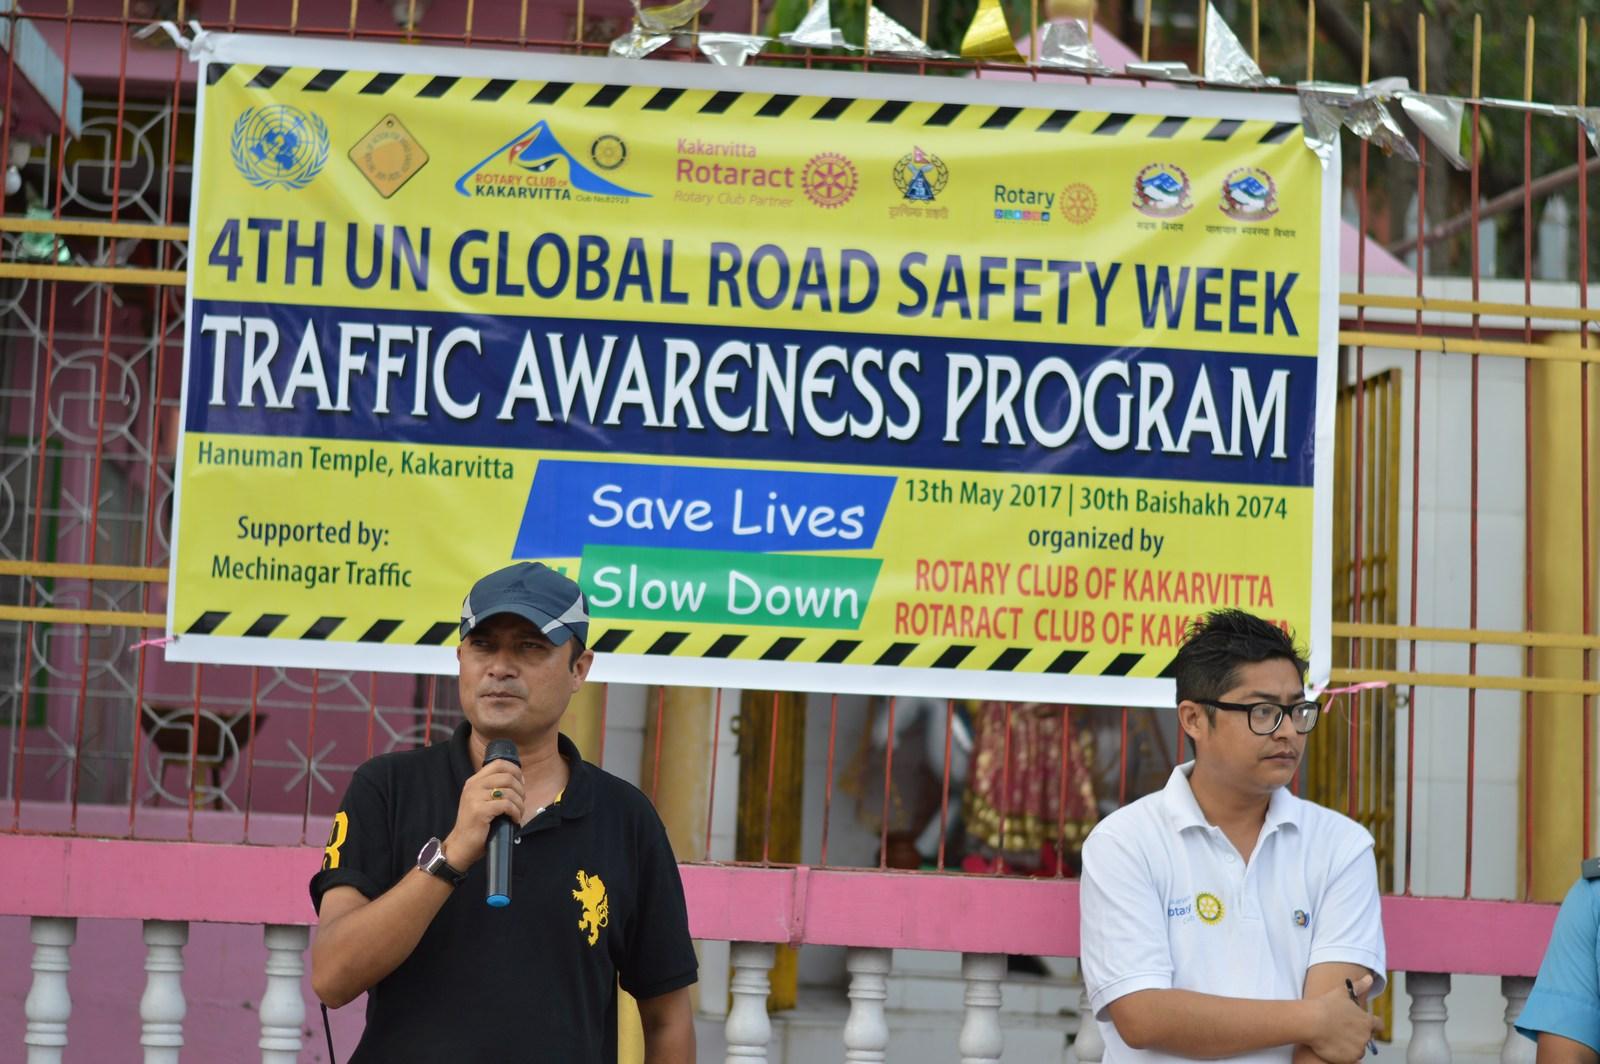 4th-UN-Global-Road-Safety-Week-2017-Traffic-Awareness-Program-Rotary-club-of-Kakarvitta-20